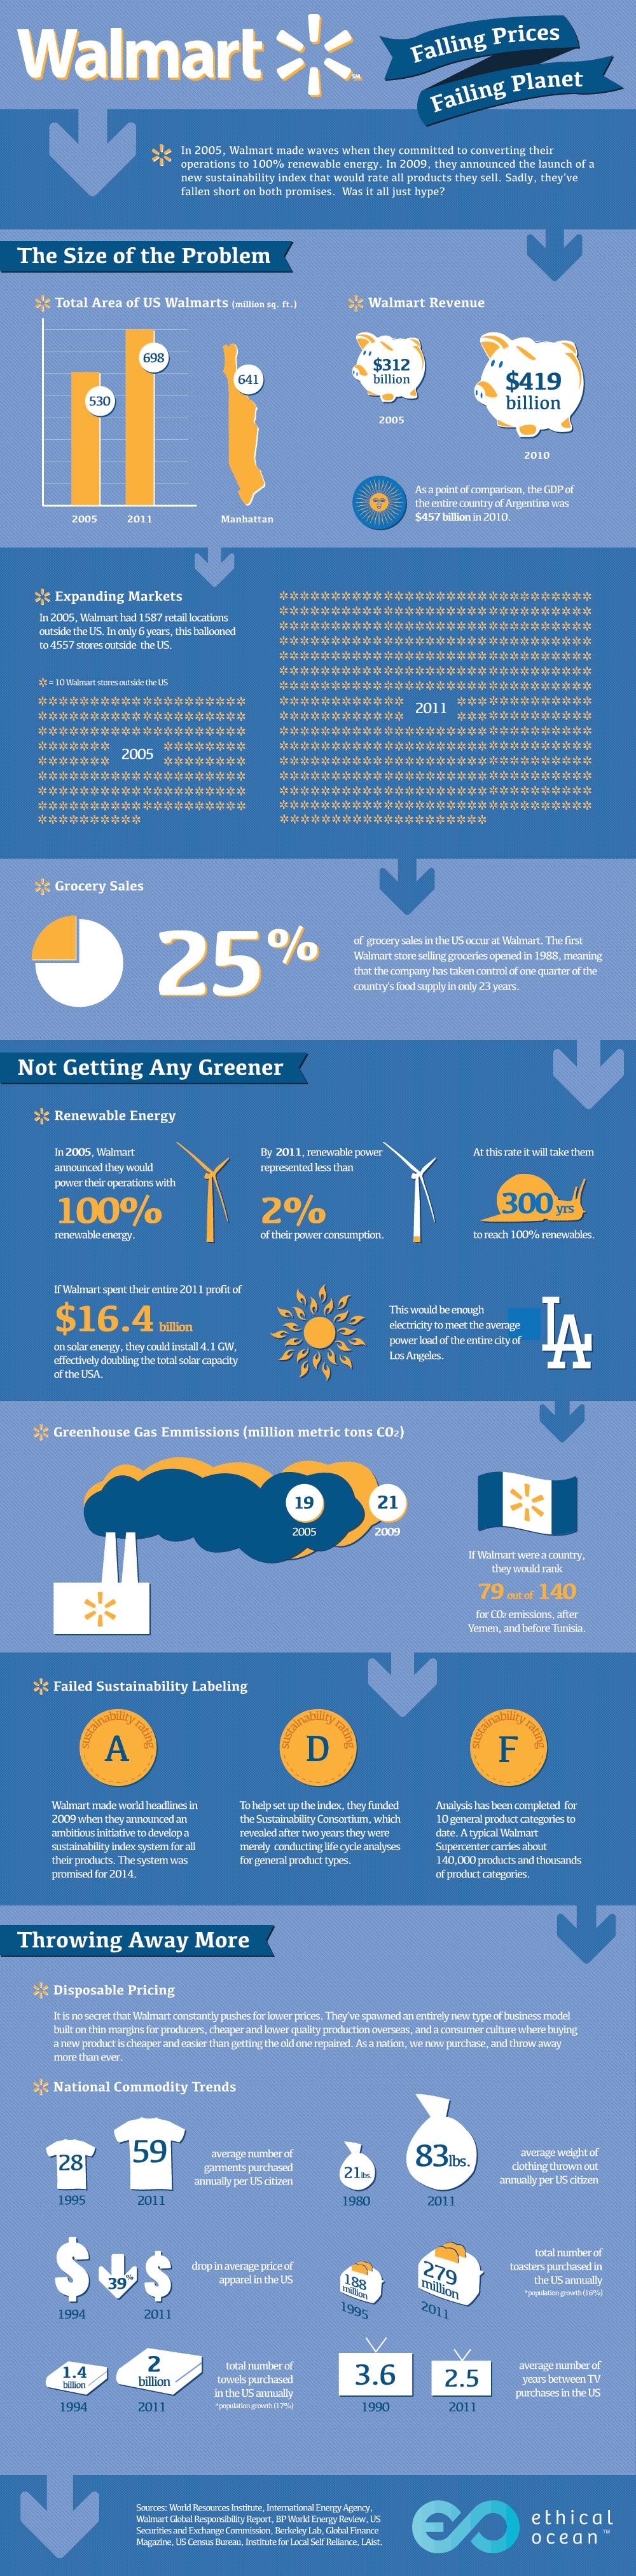 Walmart environmental initiatives infographic